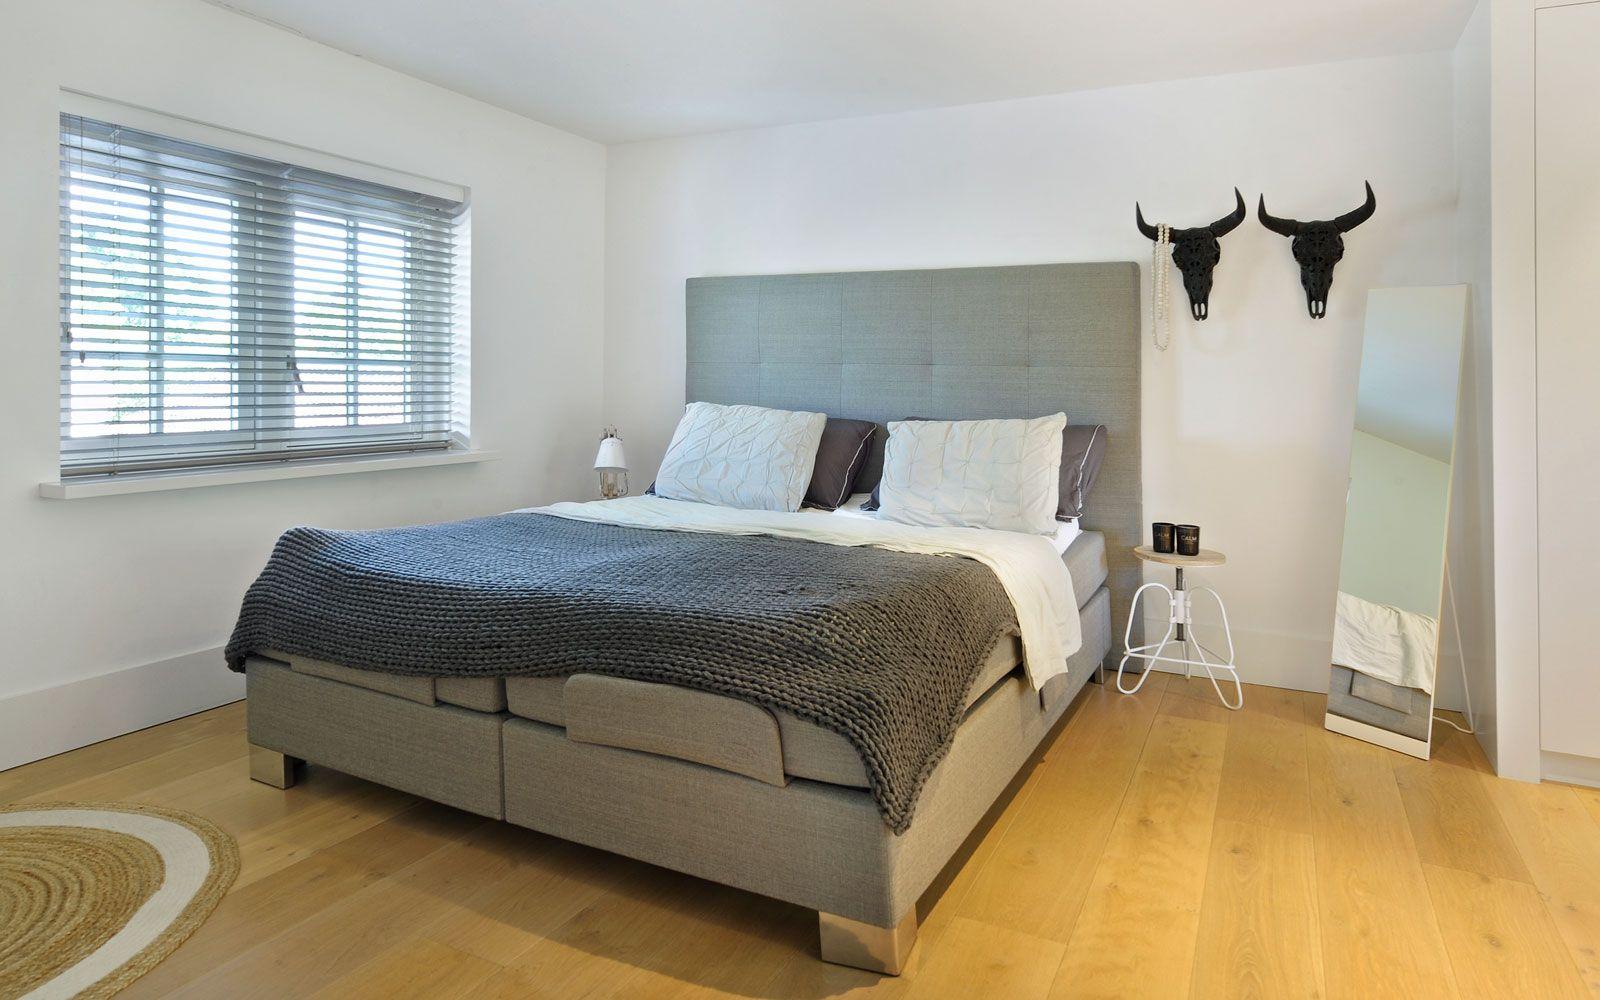 Metamorfose master bedroom and bedrooms